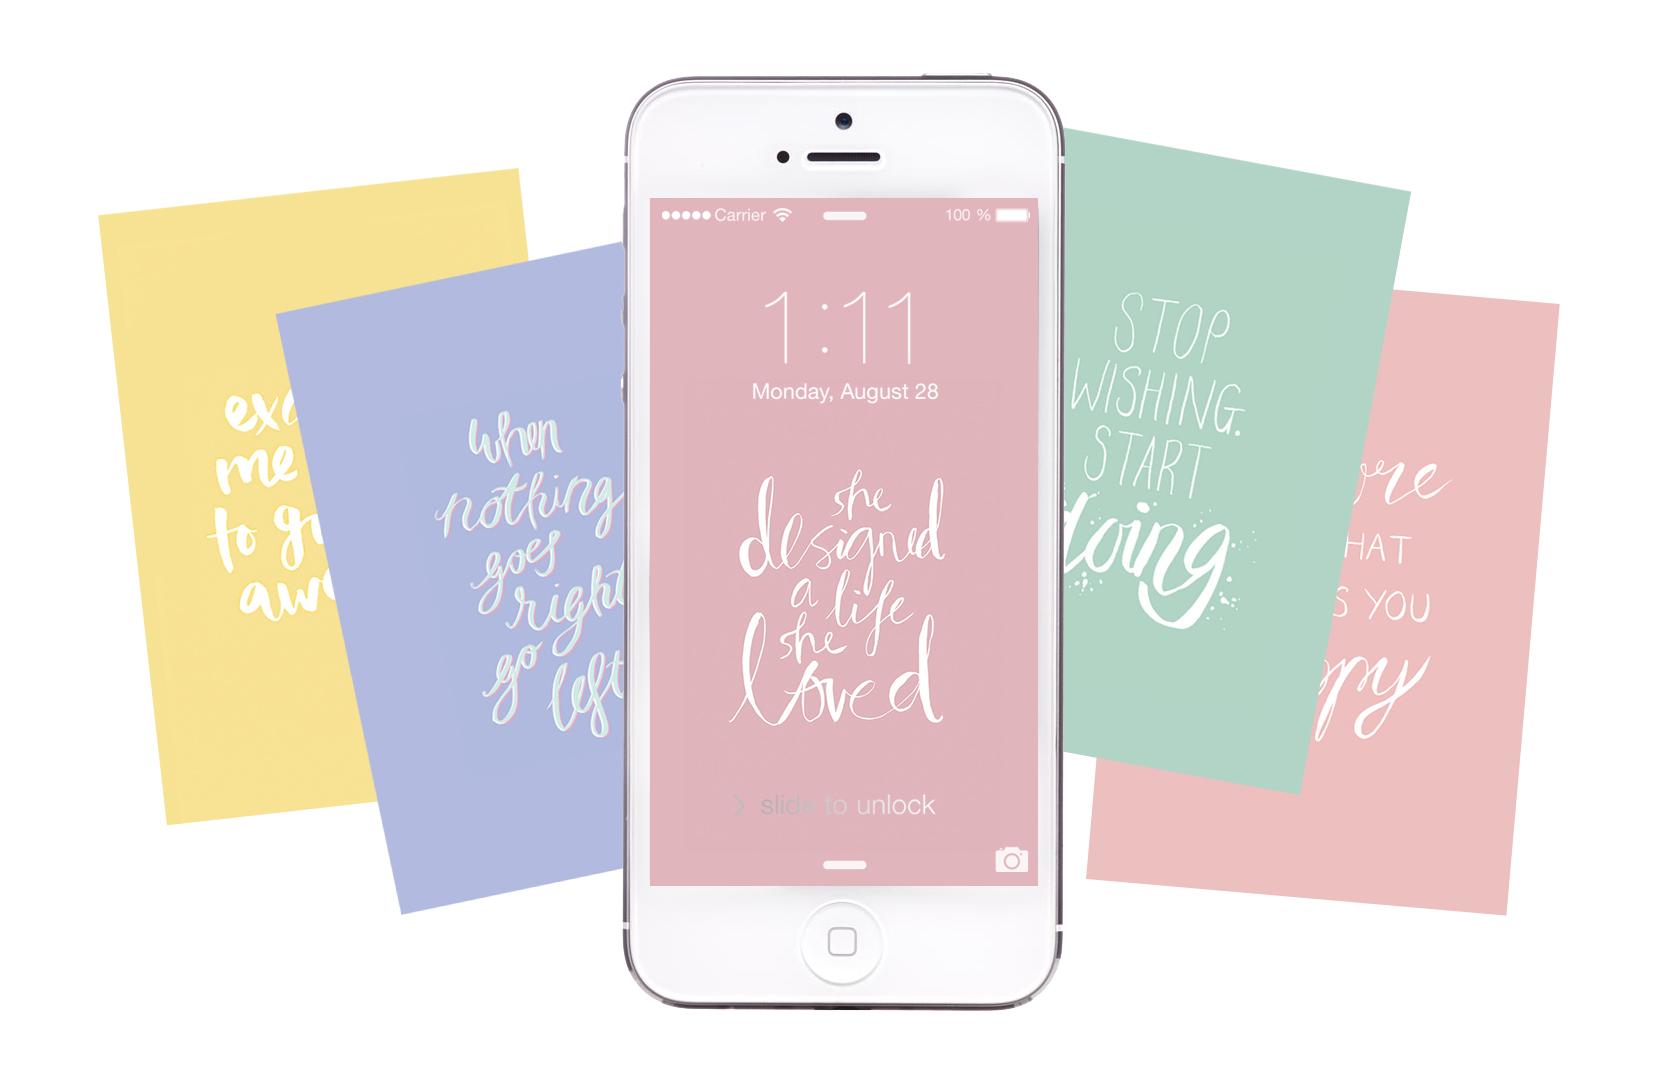 Inspirational-quotes-phone-wallpaper-pastels.jpg